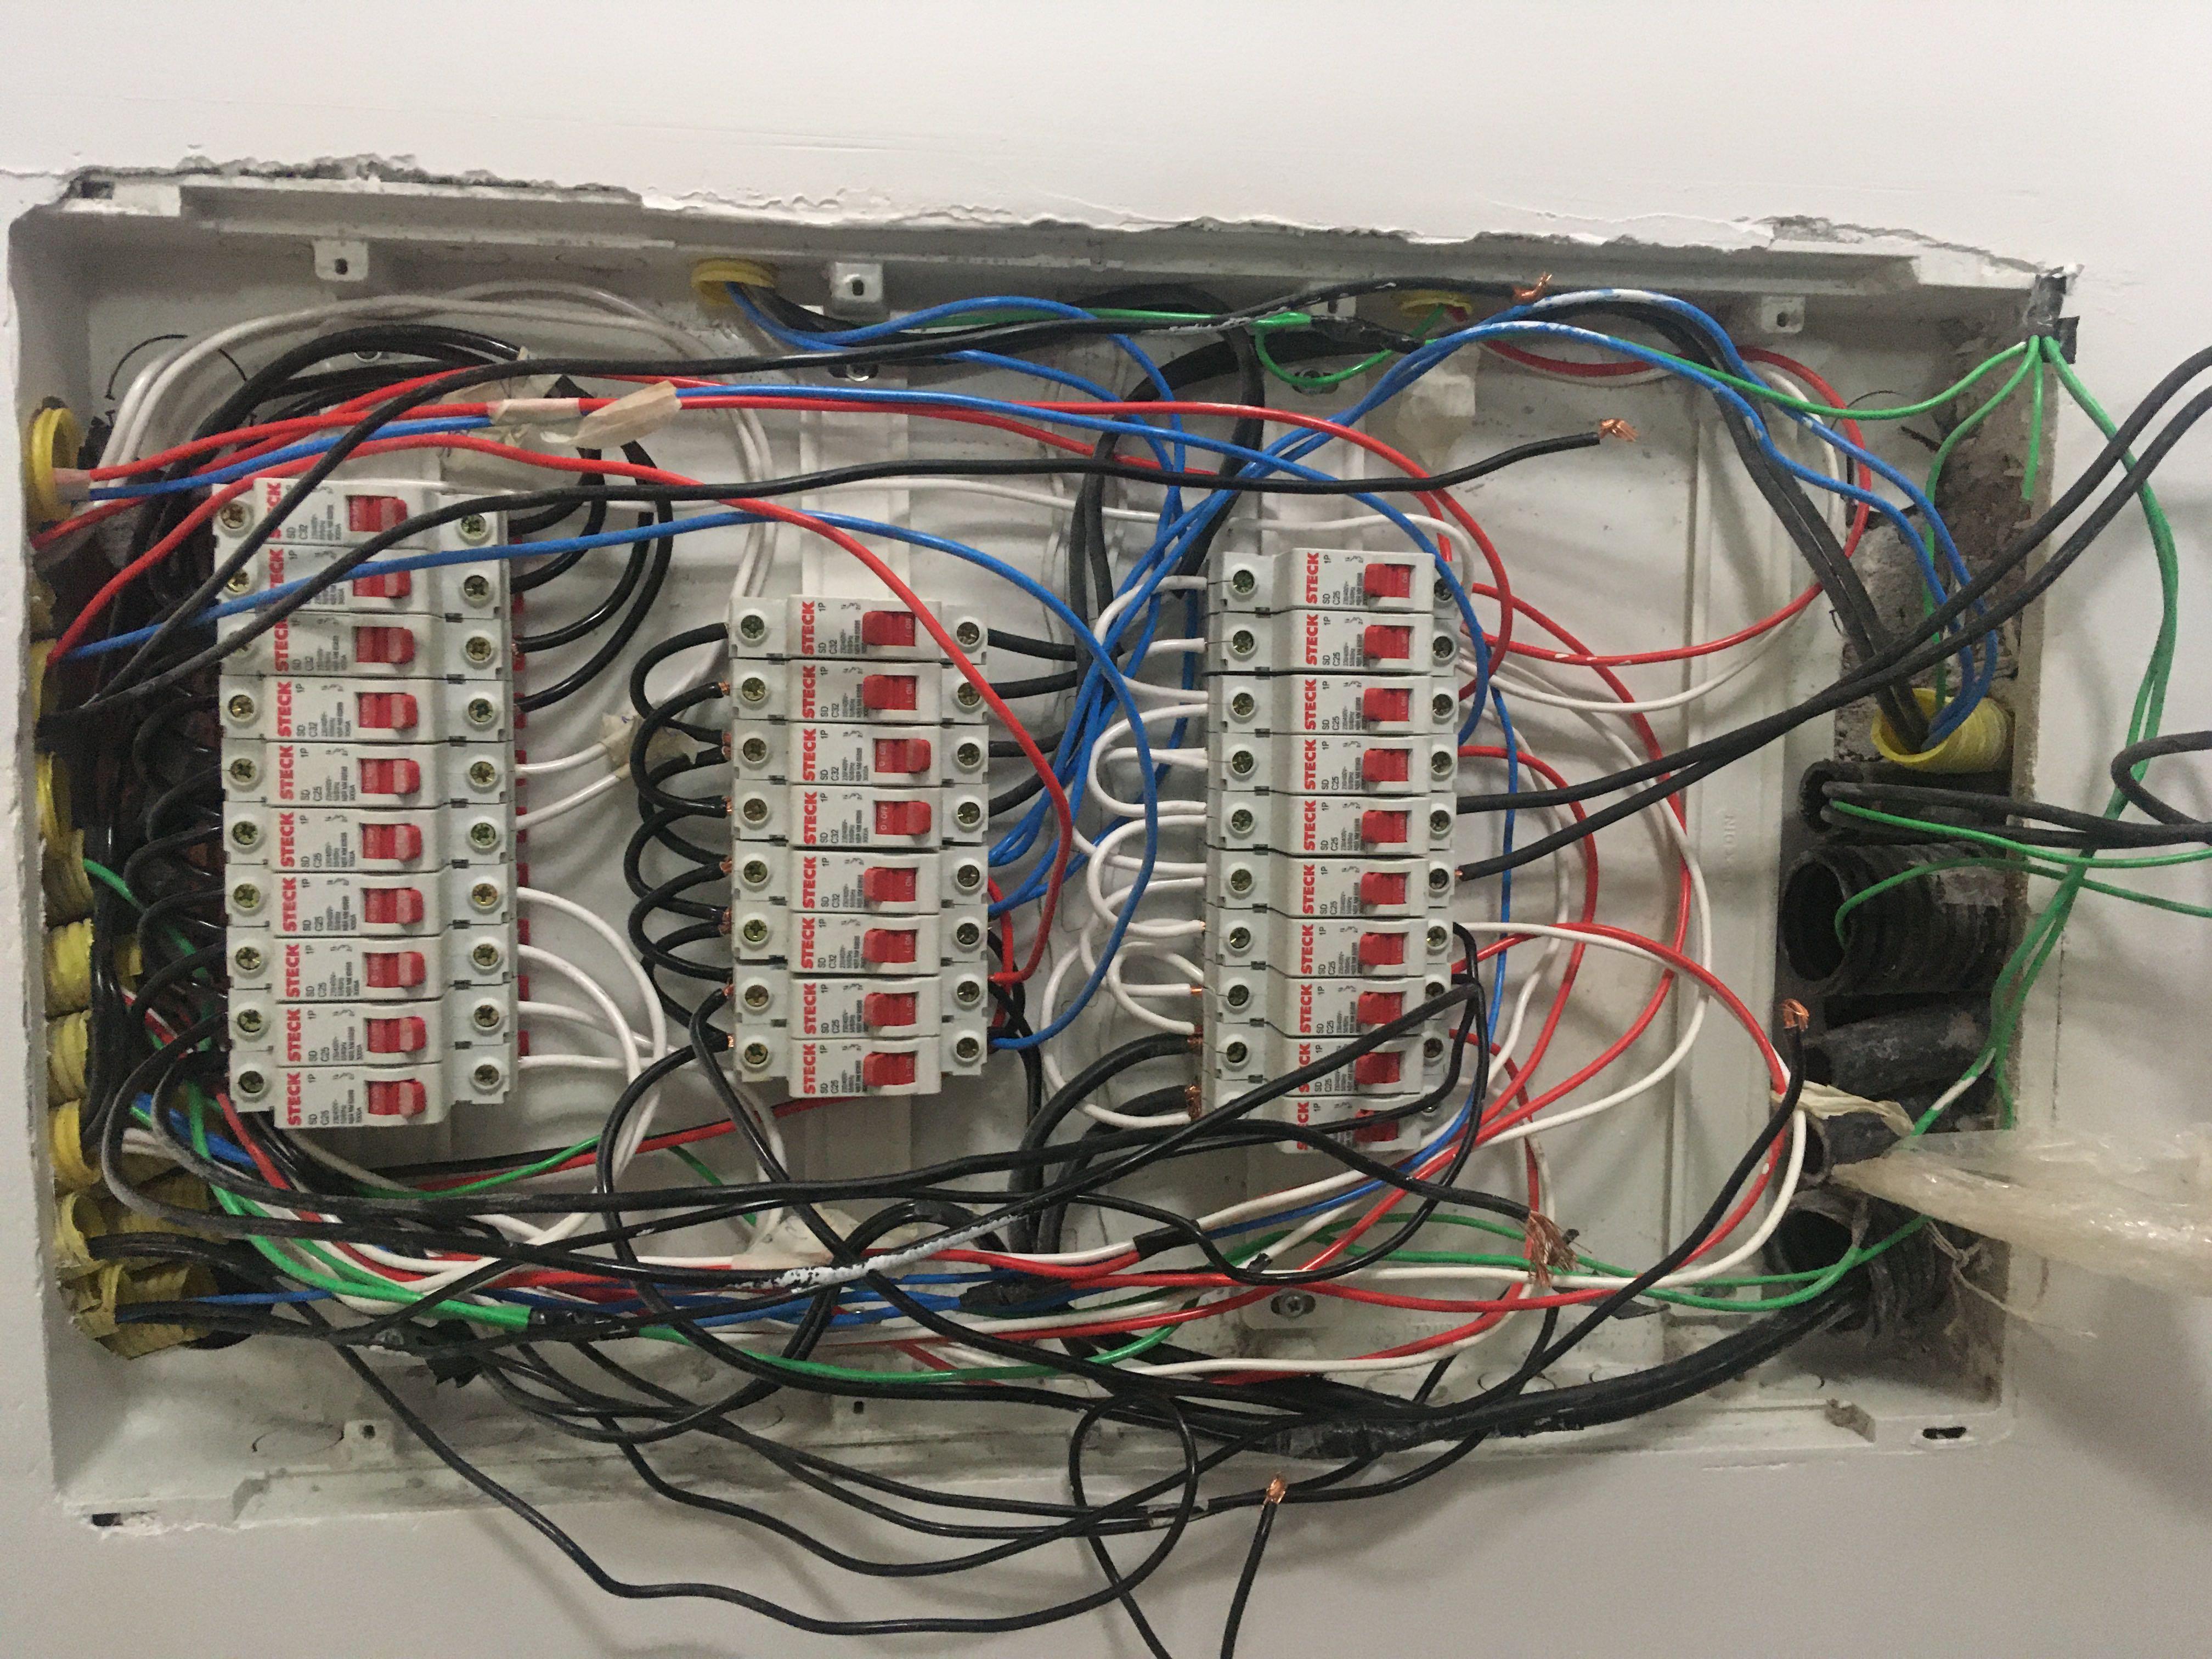 Readequando quadro elétrico (antes)